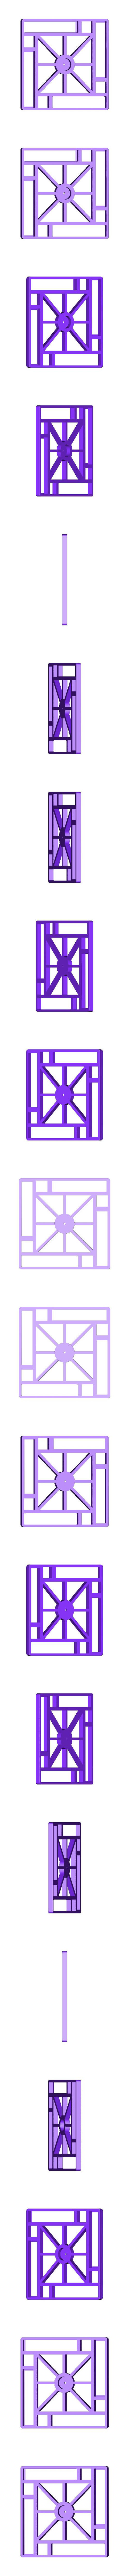 Base especiero.stl Download STL file Spice rack rotary spice rack • 3D printing design, Richars